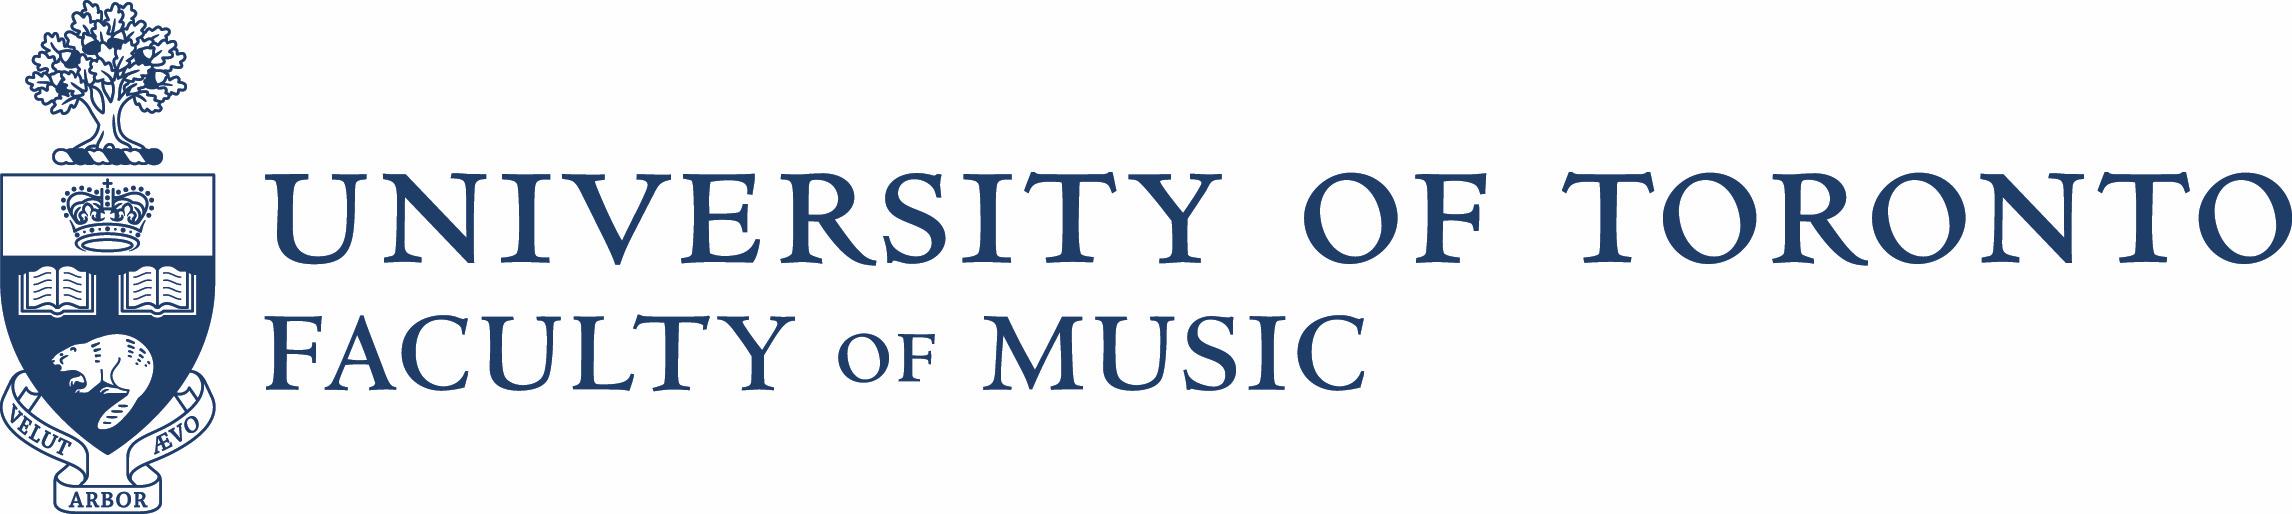 Univ of Toronto music